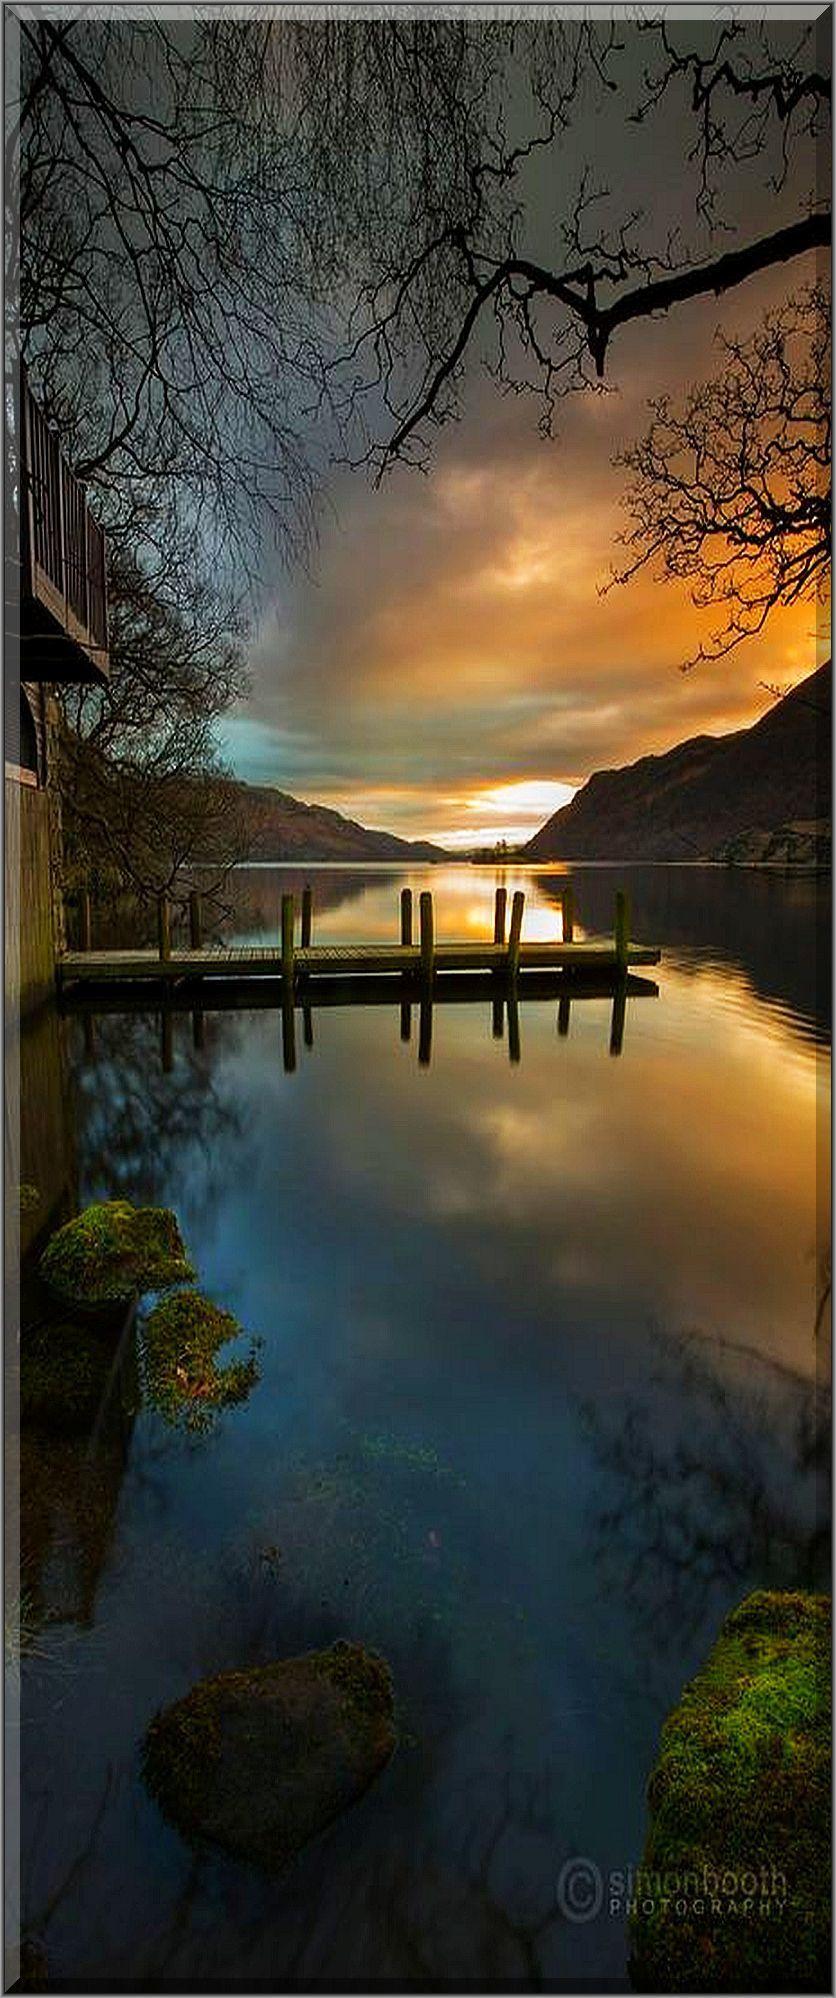 Ullswater Boathouse Lake District National Park Uk England Photo By Simon Booth Landscape Natu Beautiful Nature Beautiful Landscapes Landscape Photography